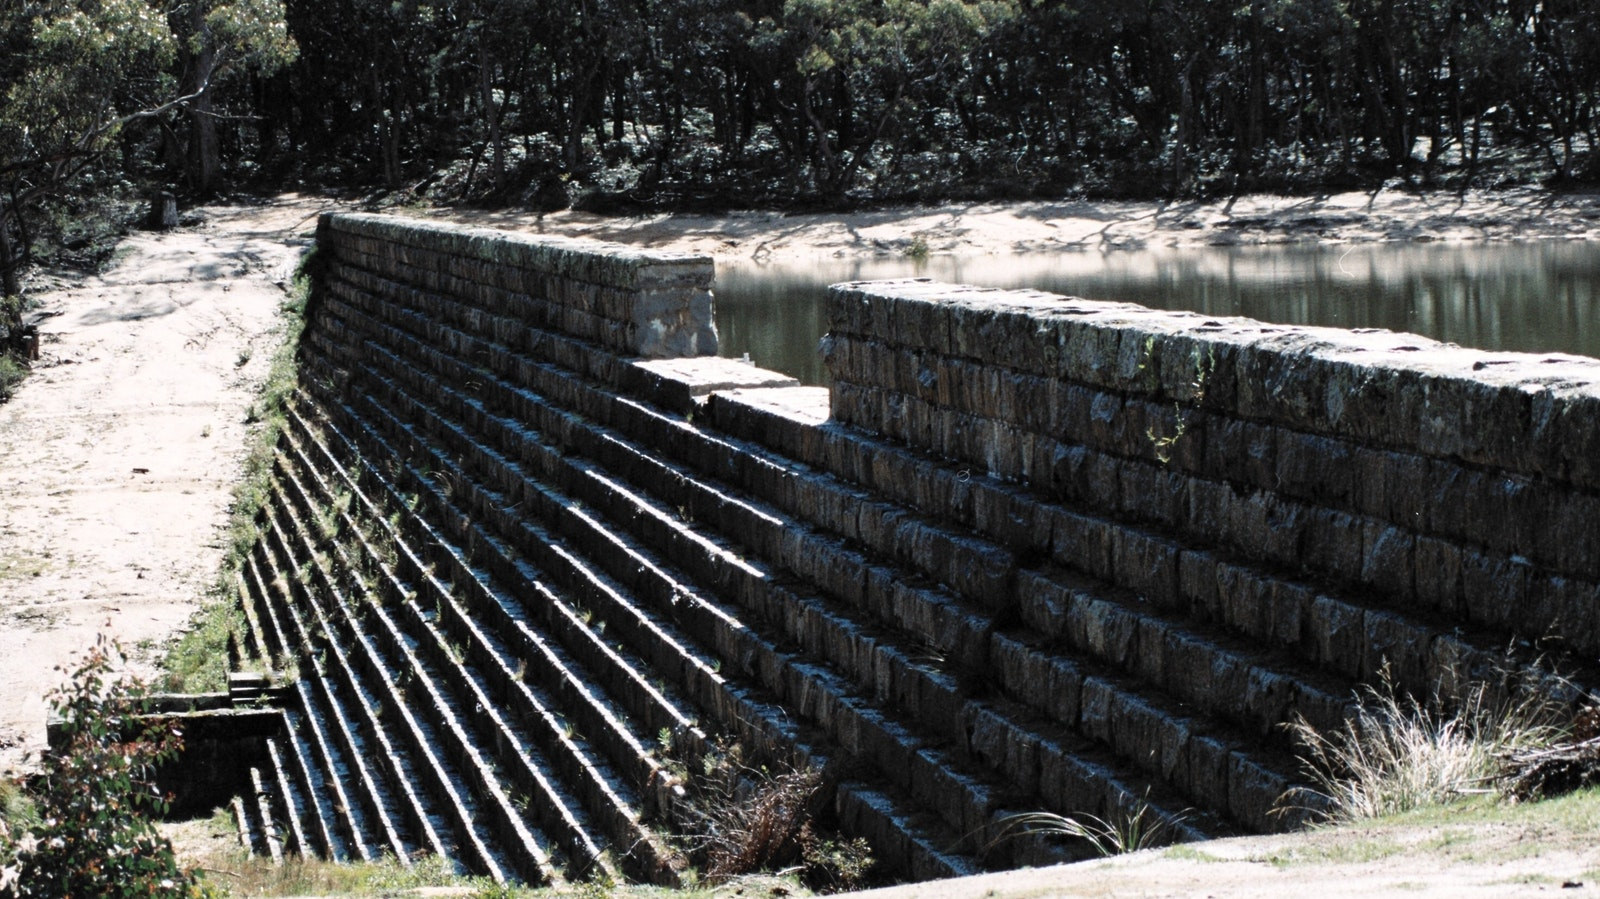 Hand built stone reservoir, Langi Ghiran State Park - GRAMPIANS